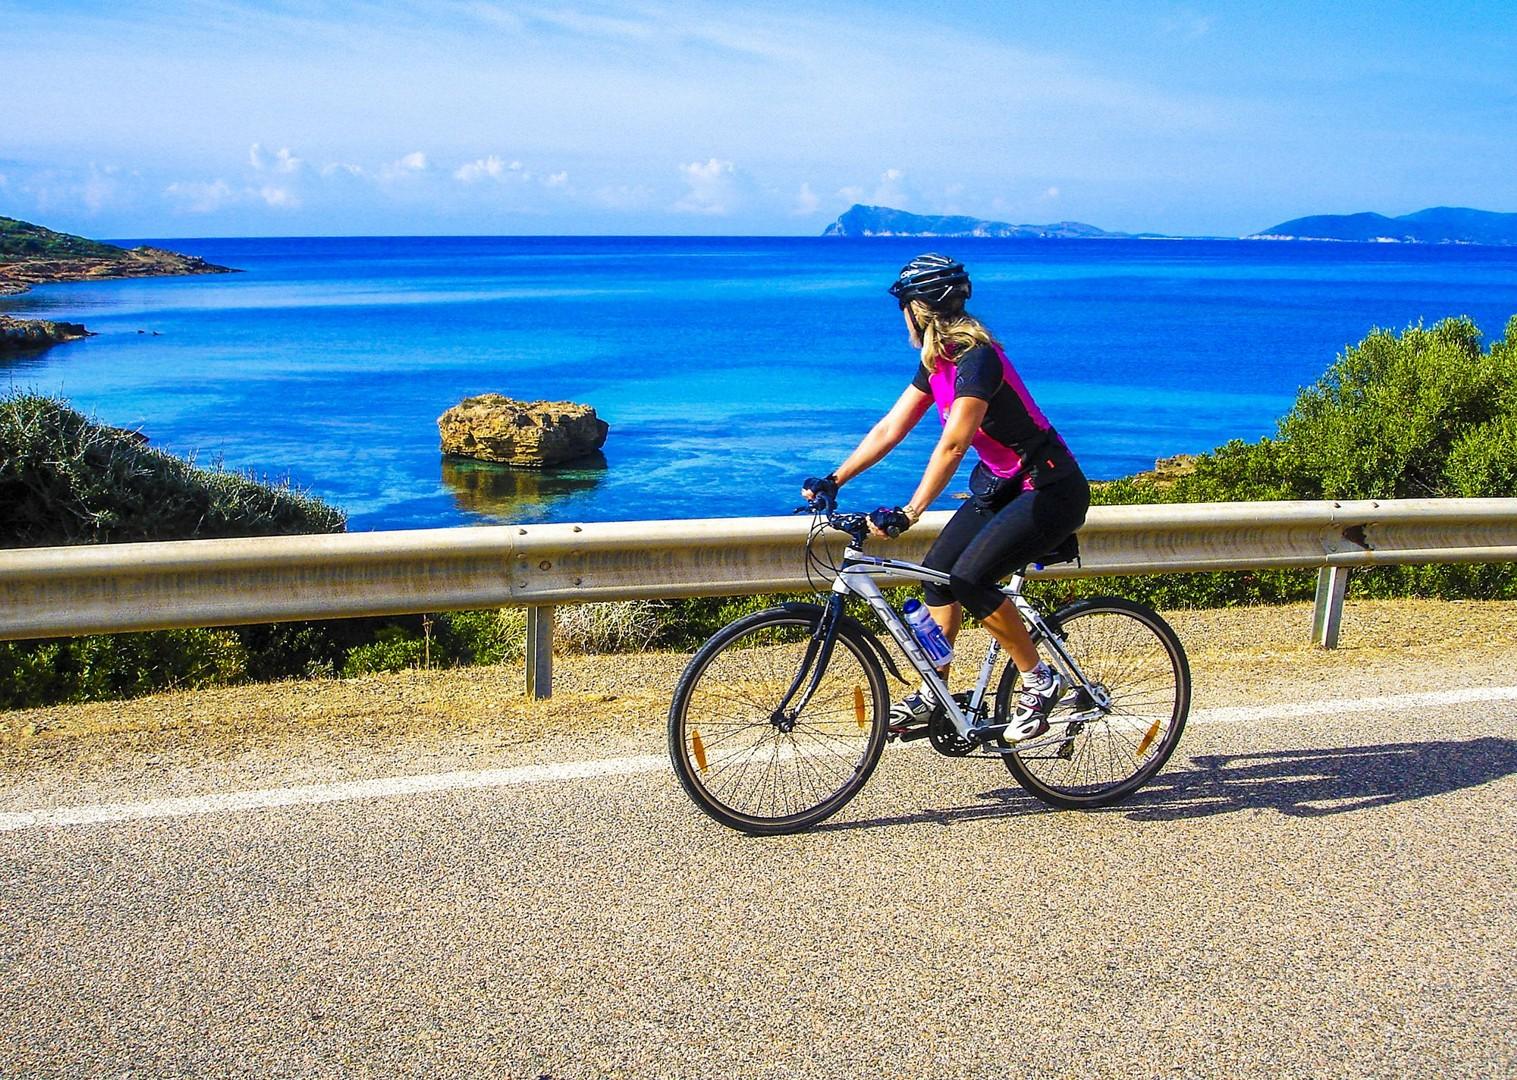 fdfsdfsdfsdfsdfsdf2.jpg - Italy - Sardinia - Island Flavours - Self-Guided Leisure Cycling Holiday - Italia Leisure and Family Cycling